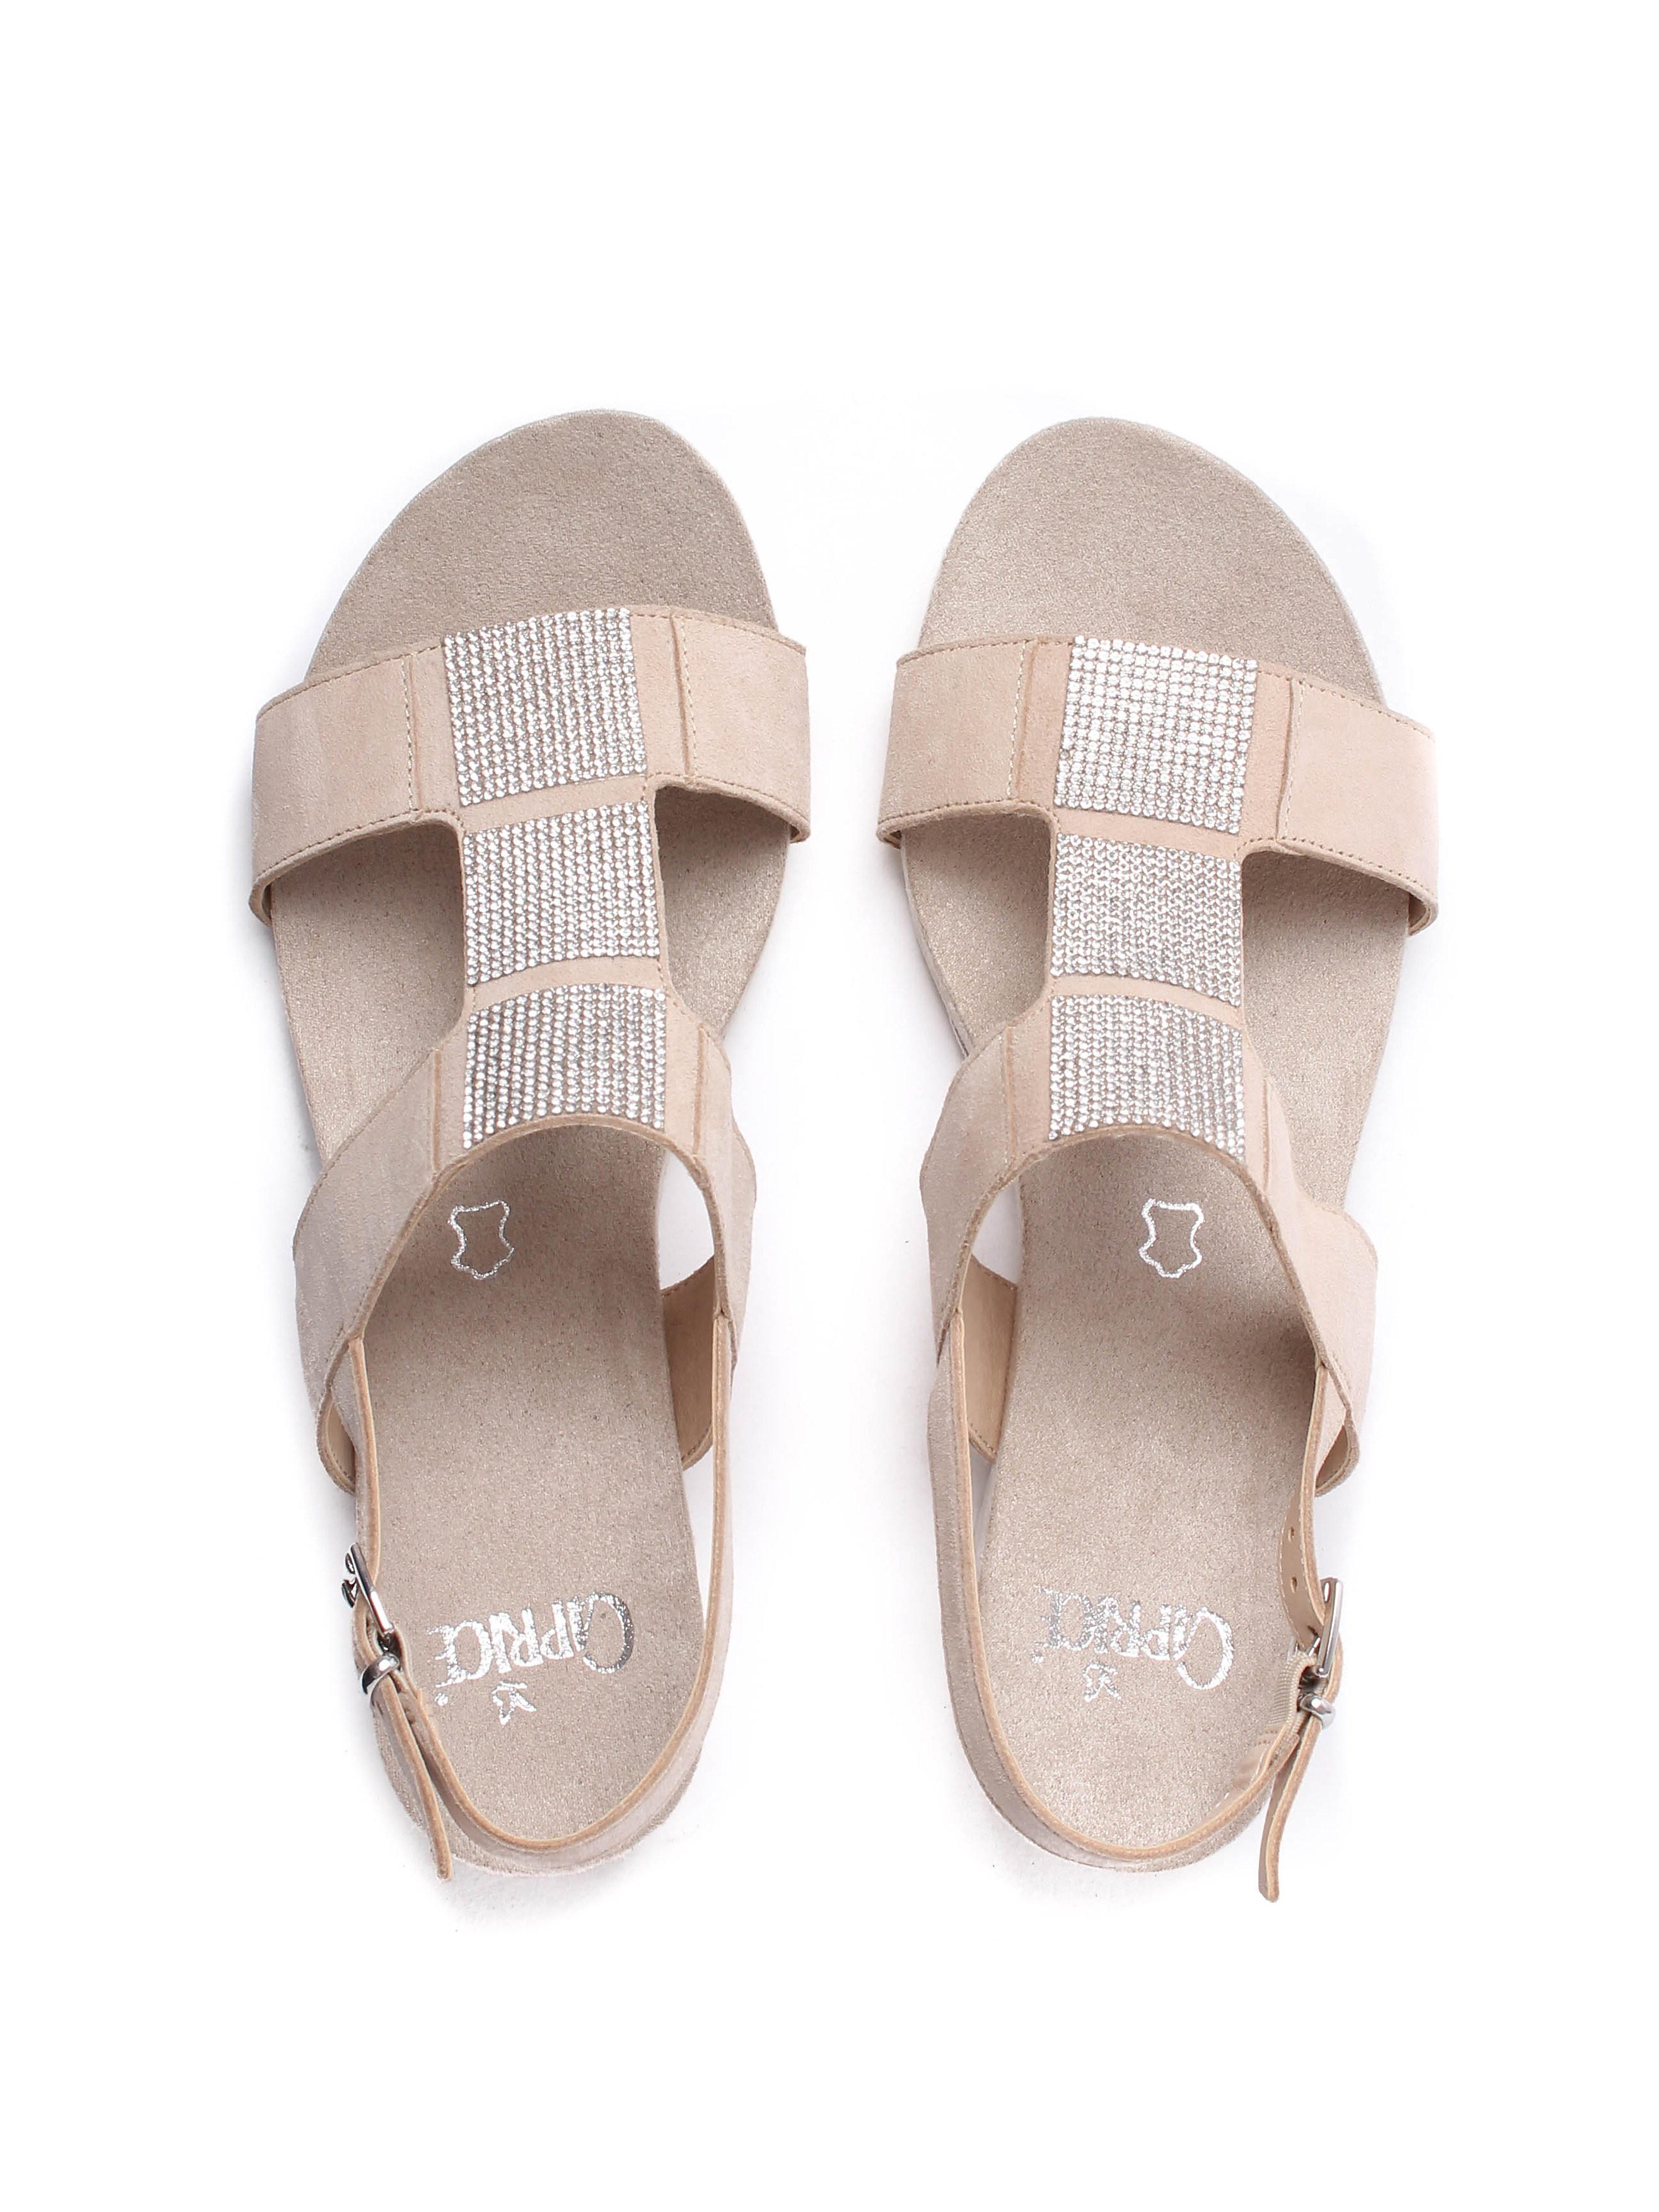 Caprice Women's Glitter Suede Wedge Sandals - Beige